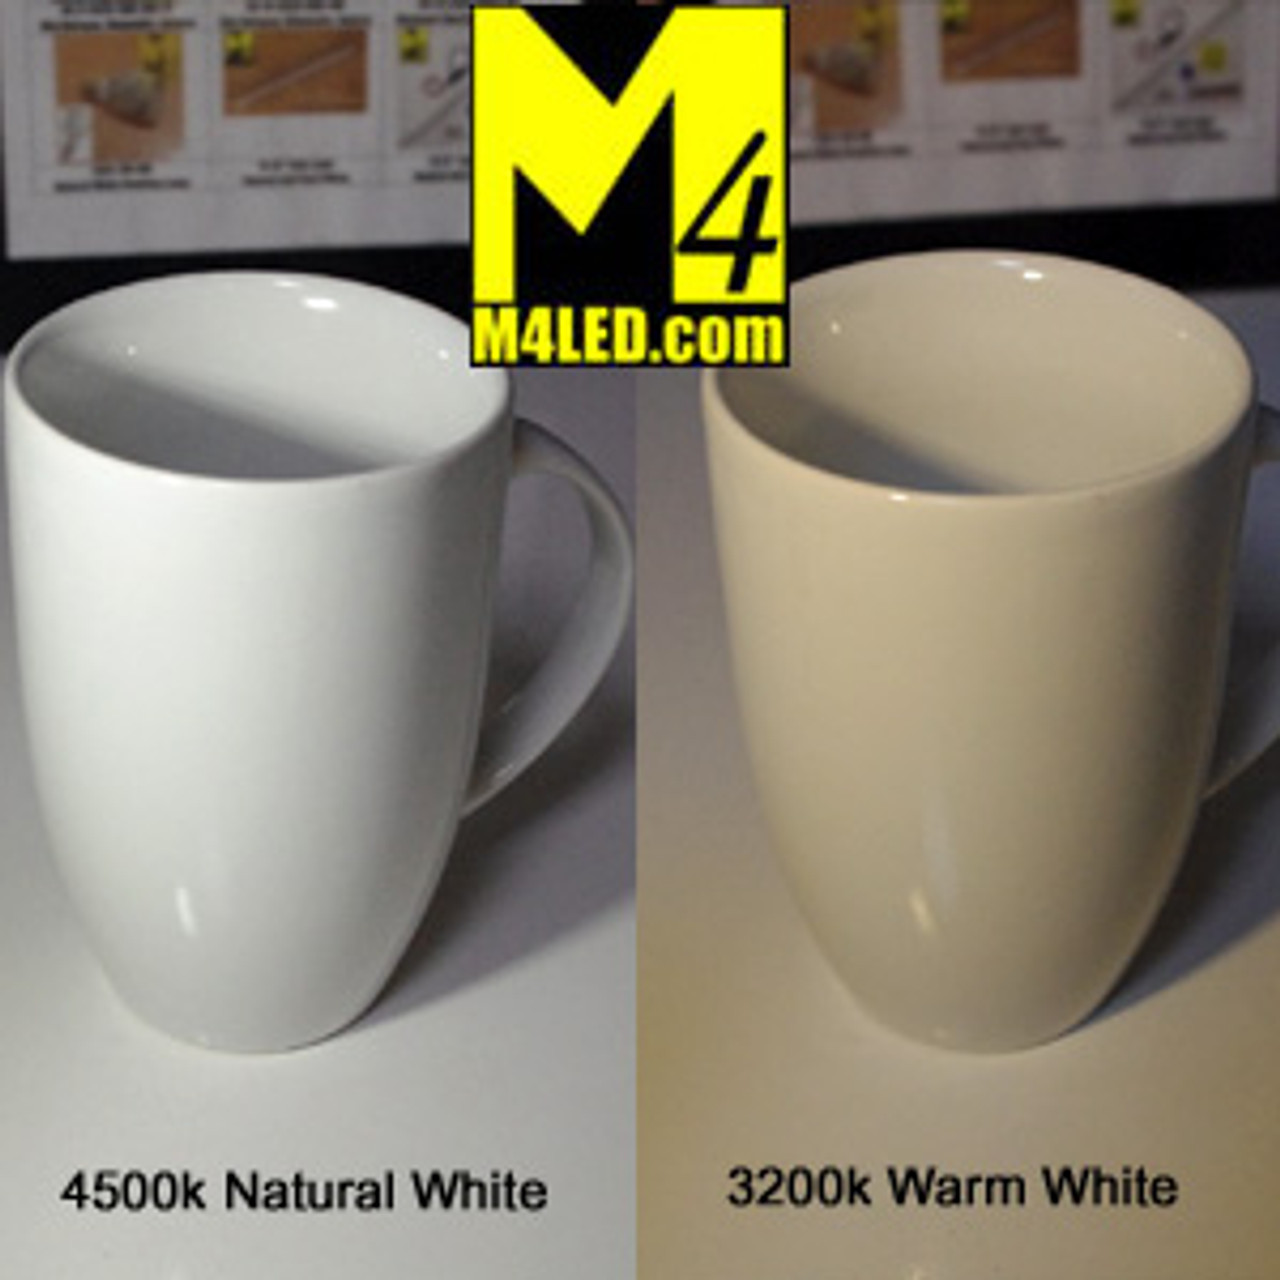 RETROFIT-6-5630-WIRE-WW Replacement for C.E. LED Fixture Warm White